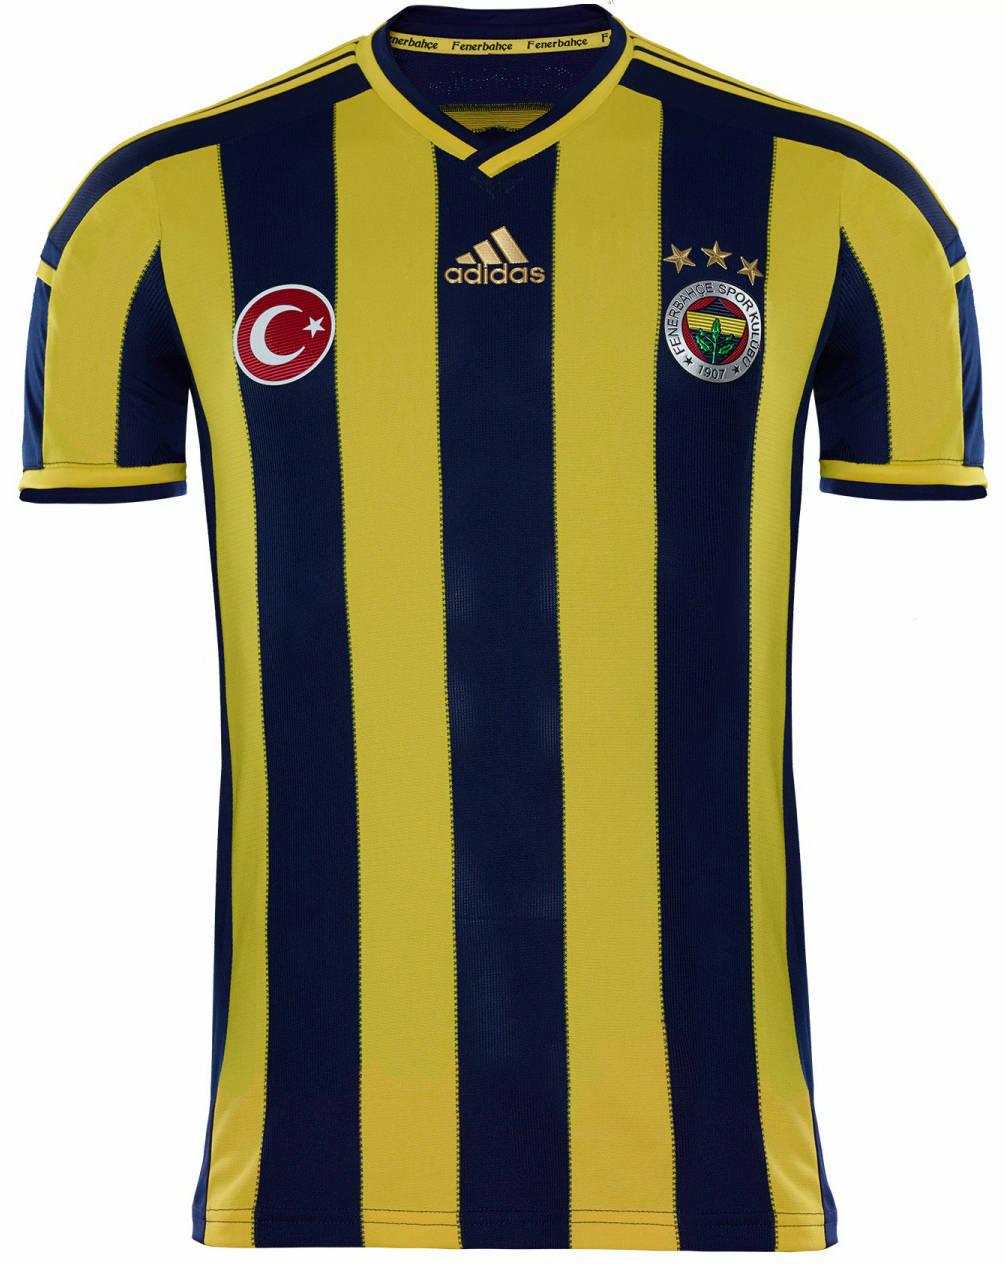 New Fenerbahçe 14-15 Kits Released